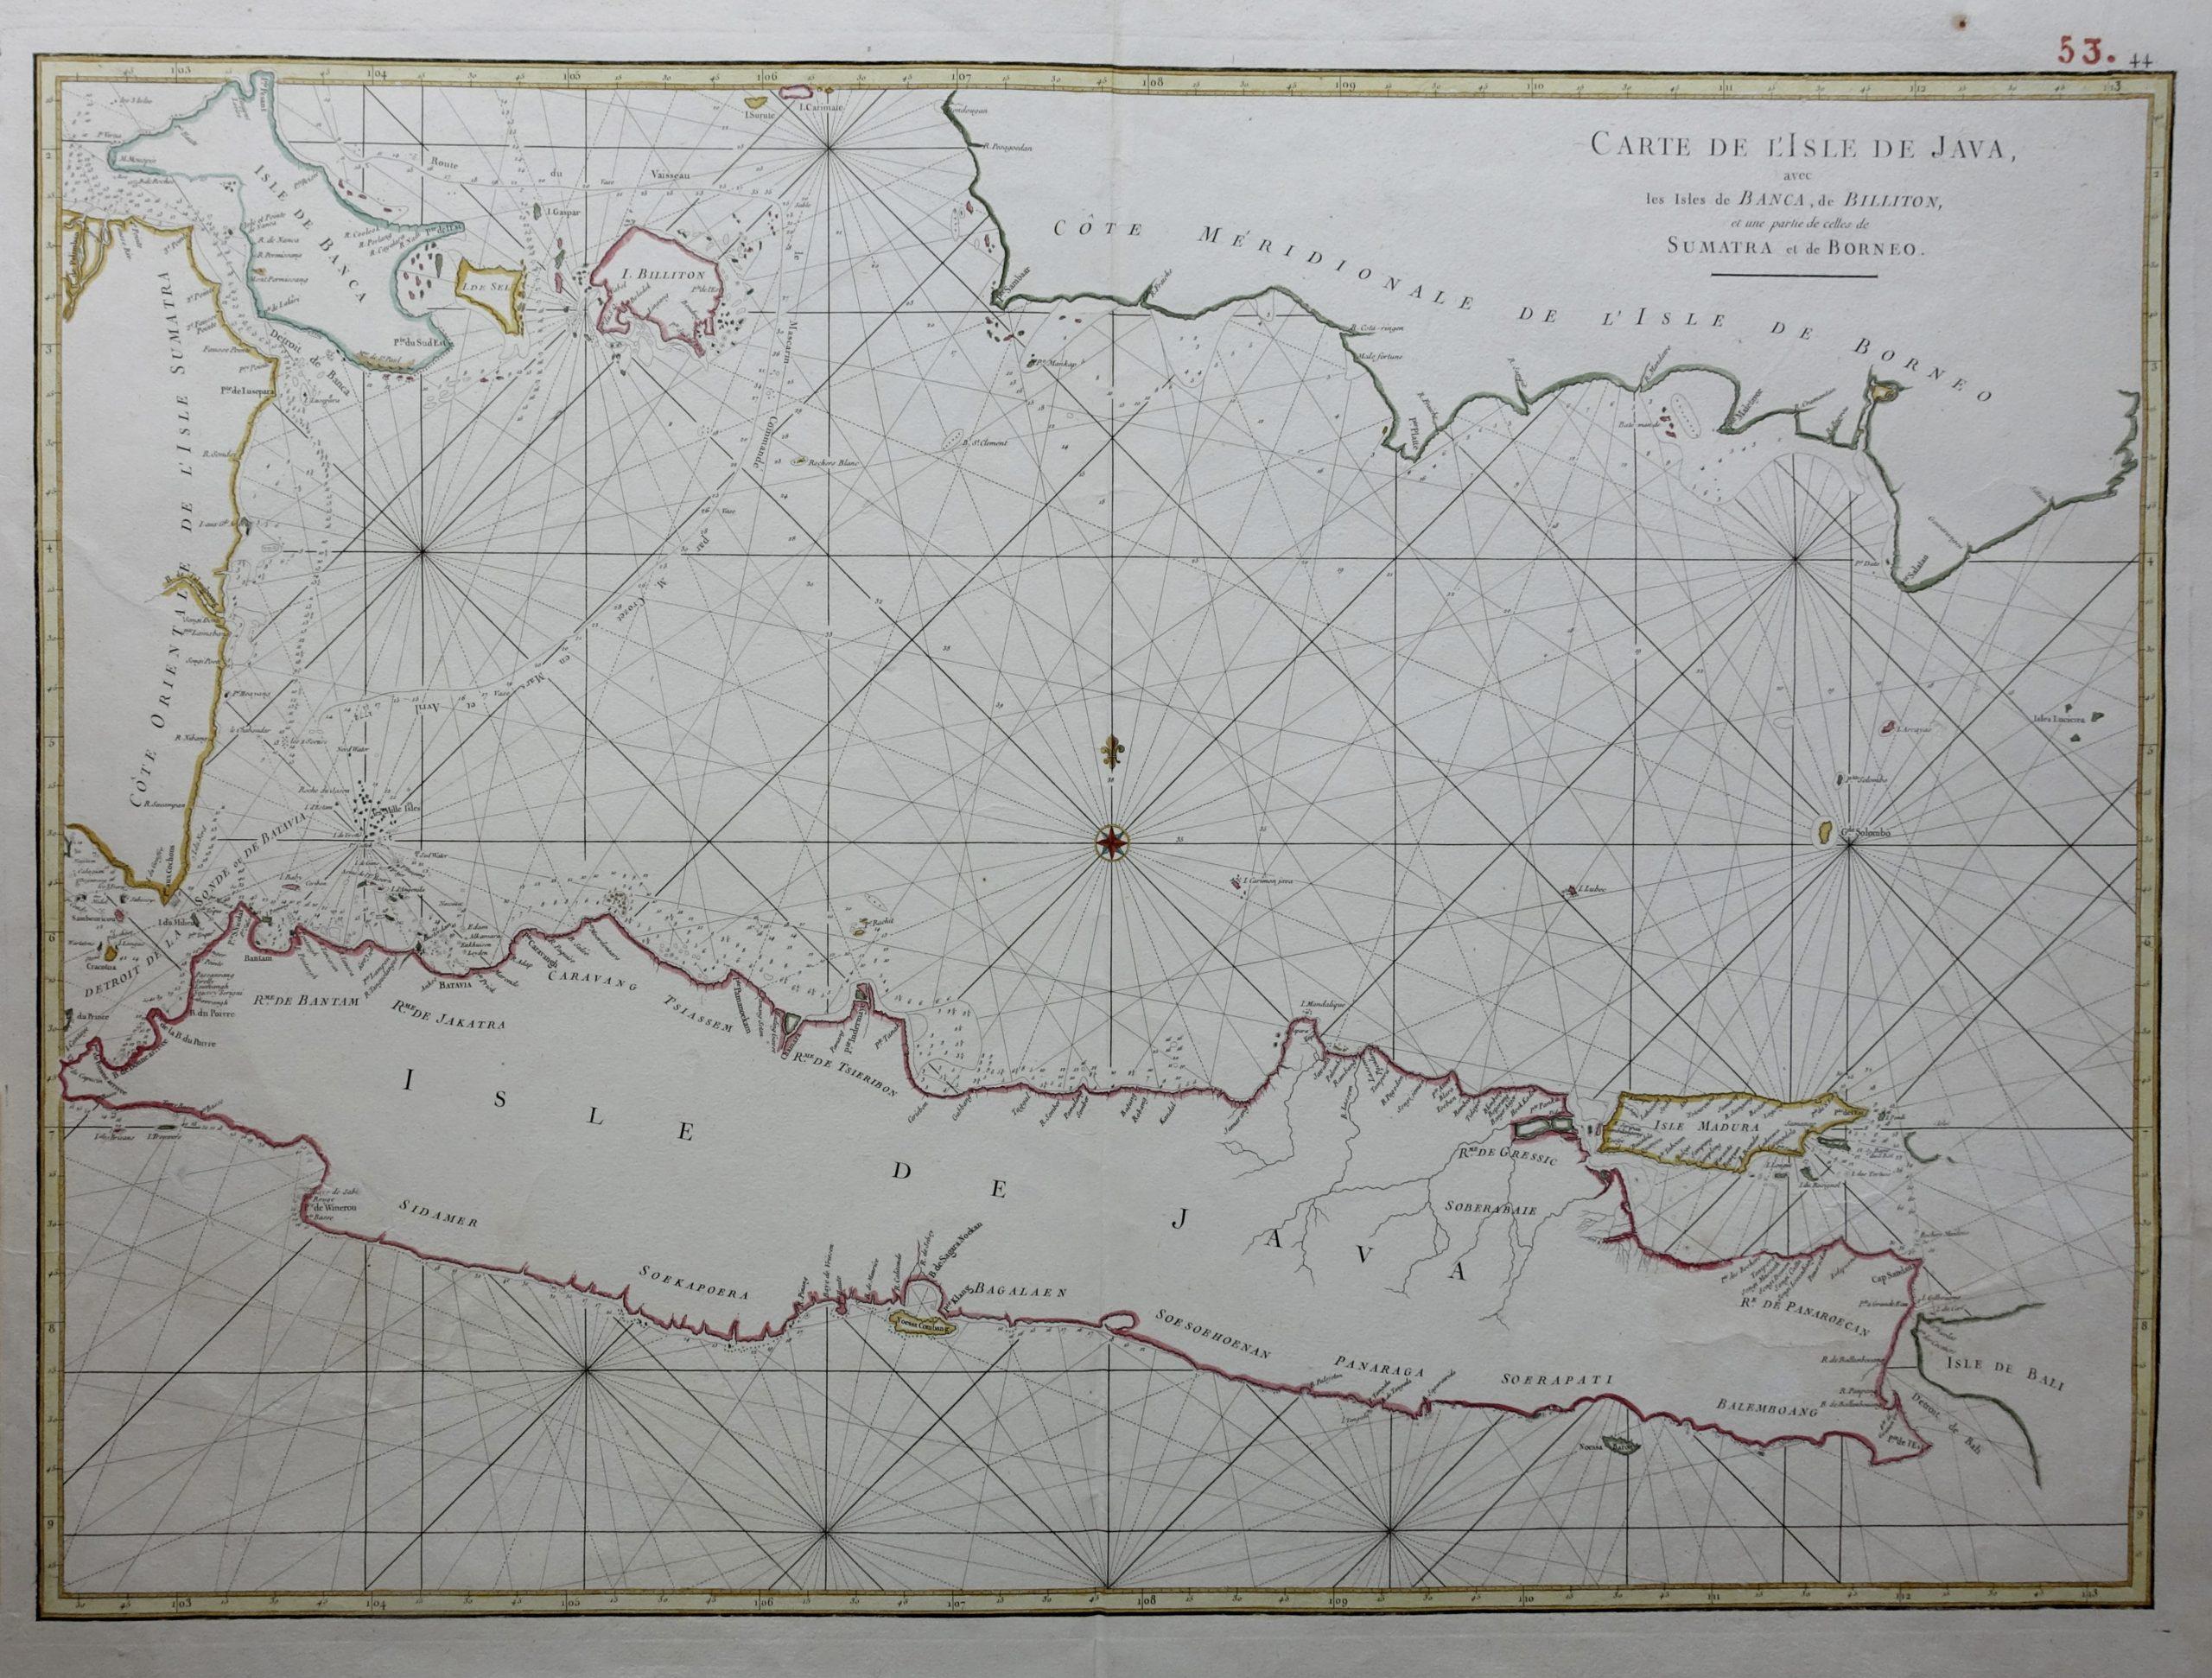 Sea Chart of Java - Mannevillette (1750)